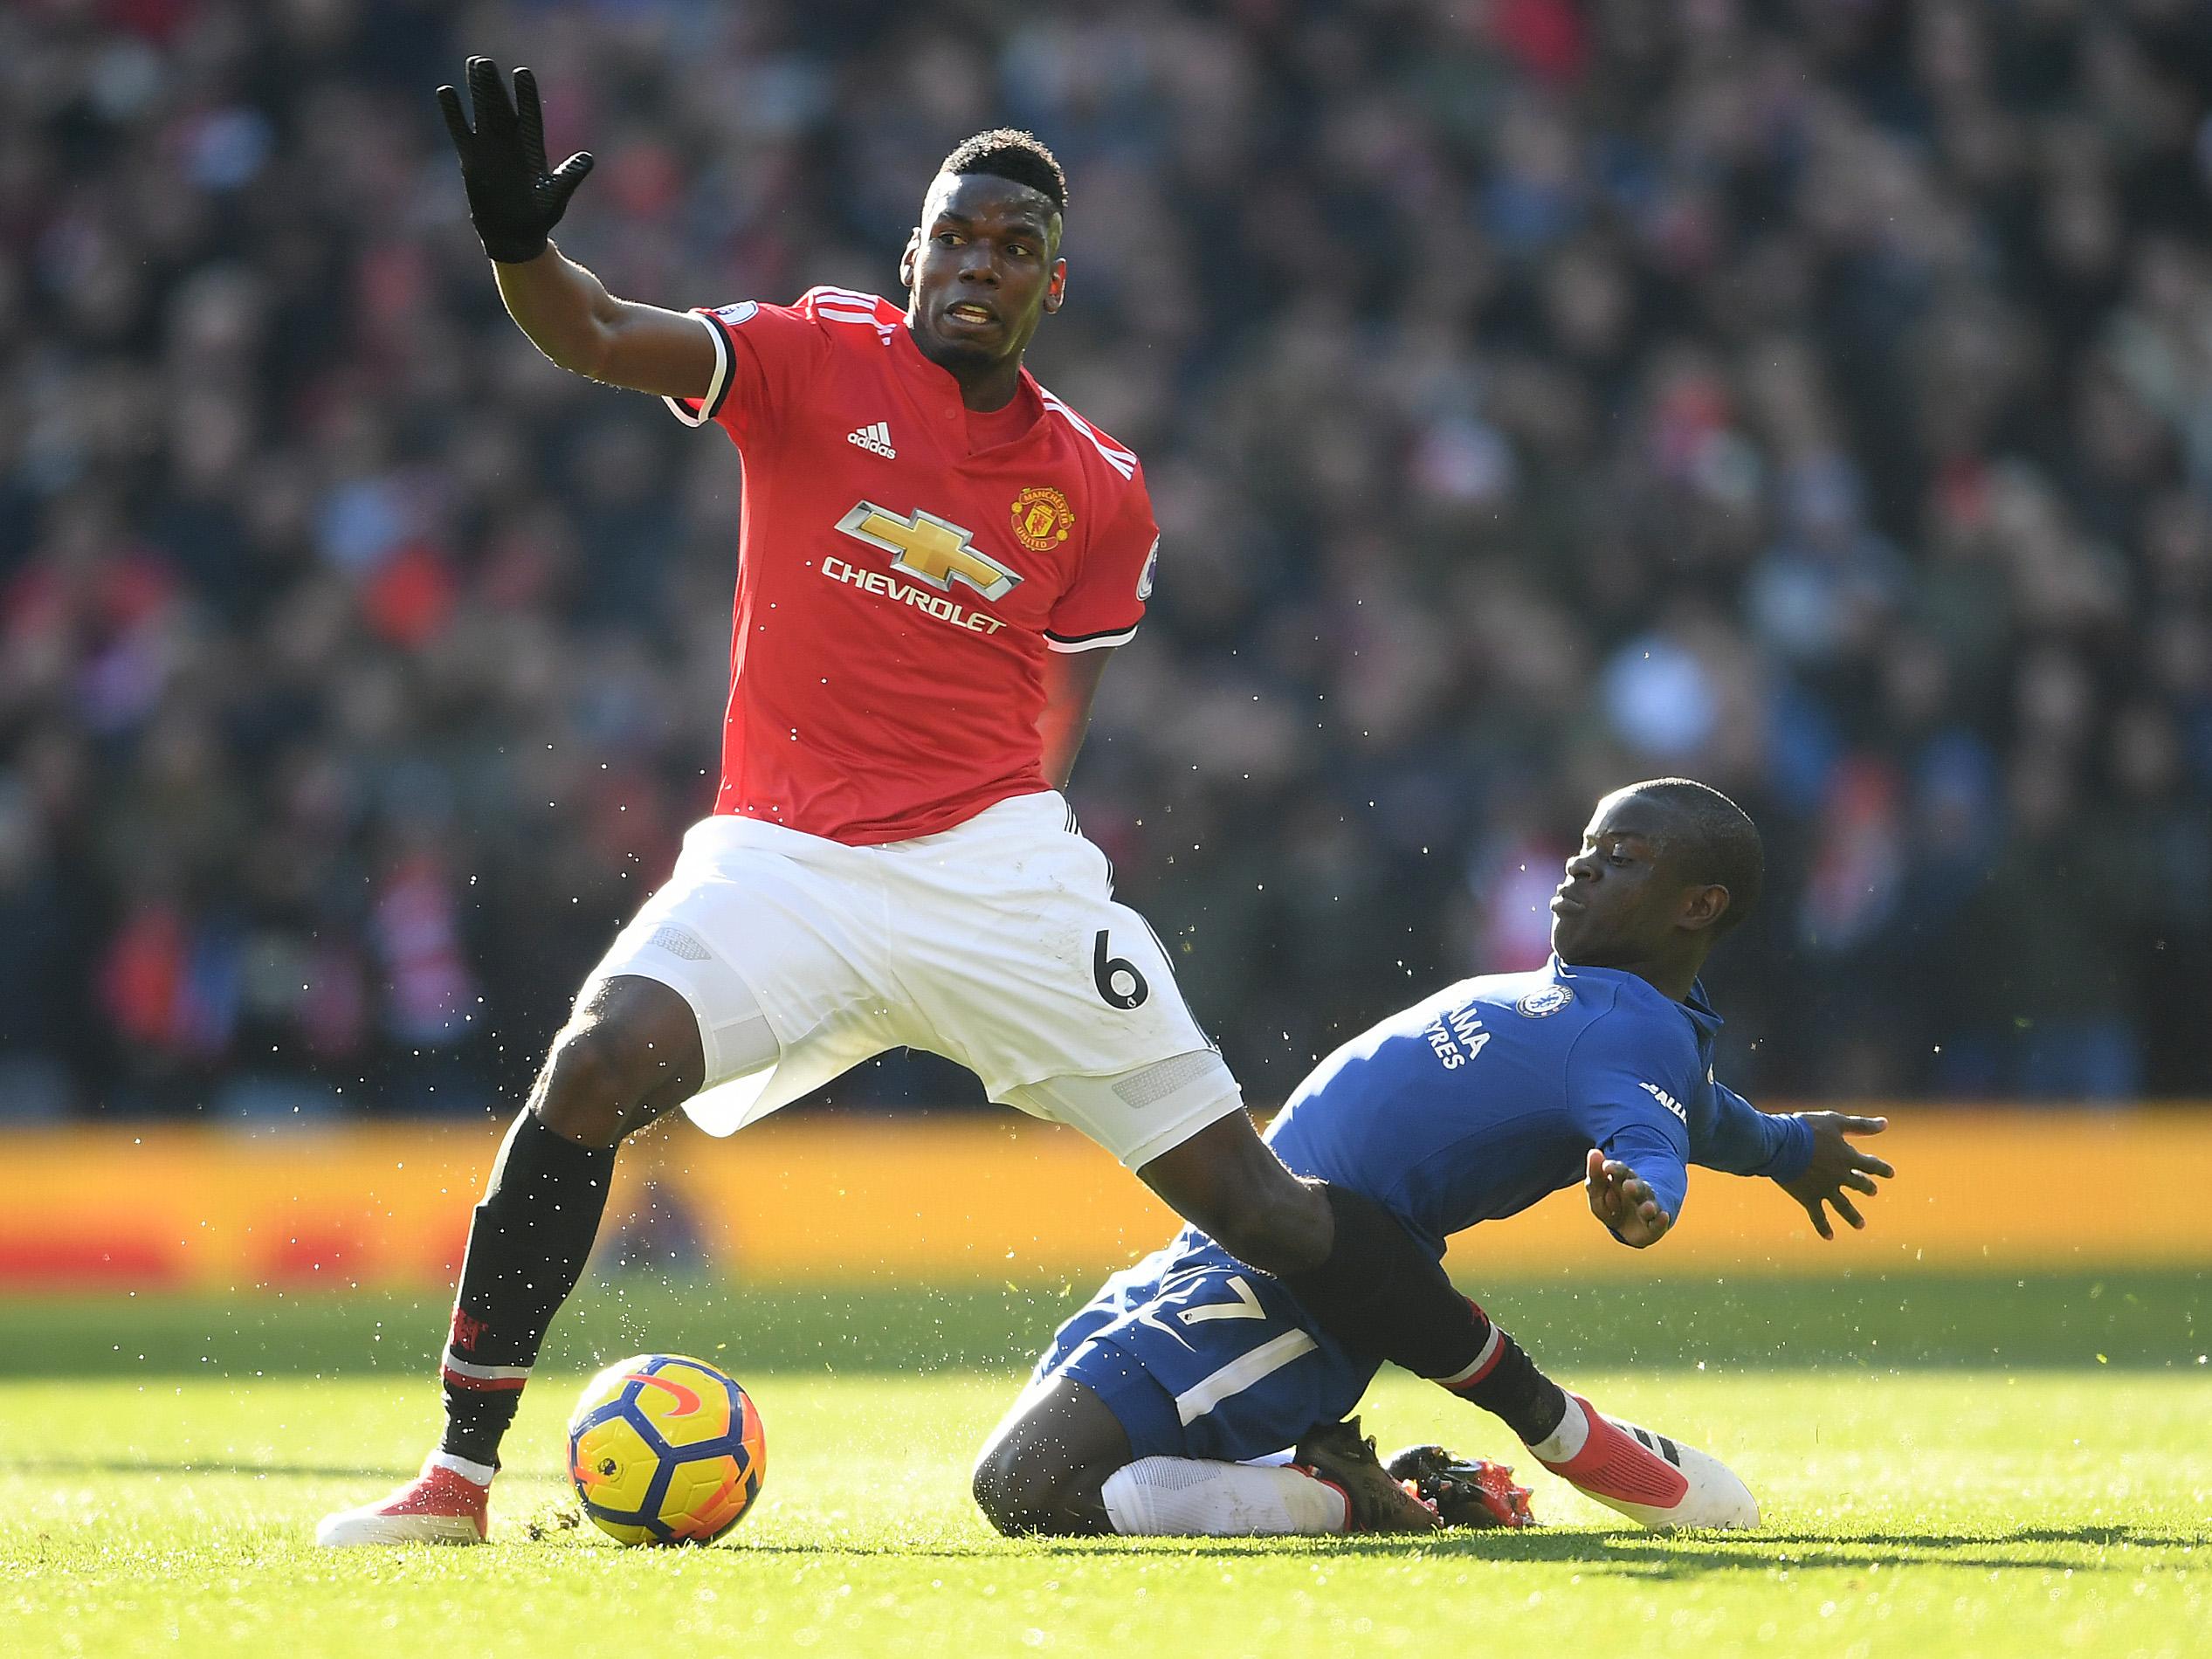 Manchester United v Chelsea - Premier League